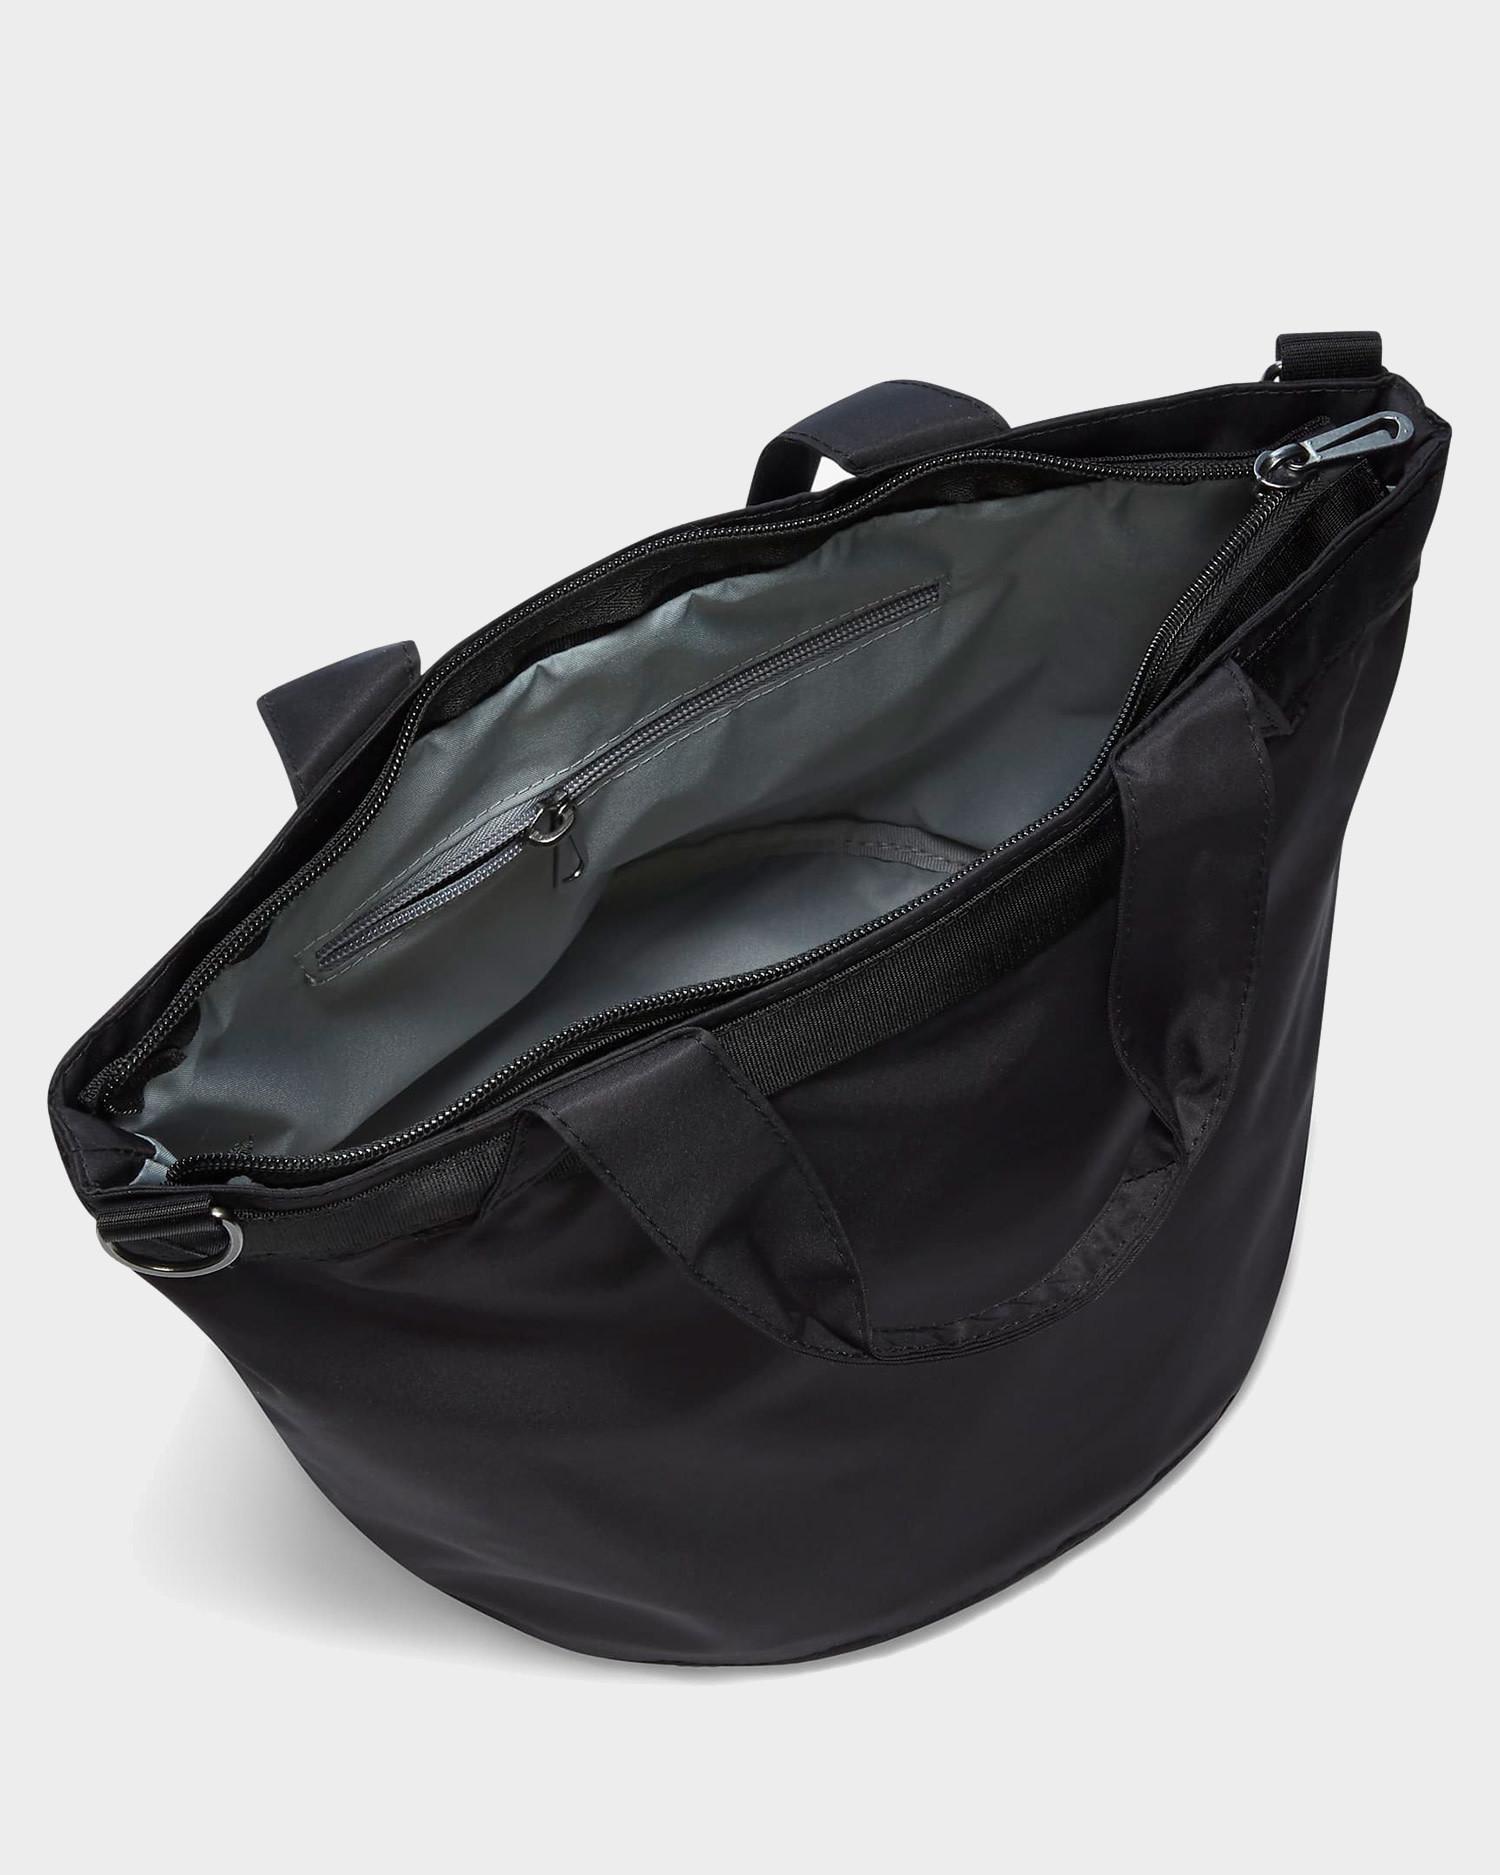 Nike Sportswear Futura Luxe Bag Black/White